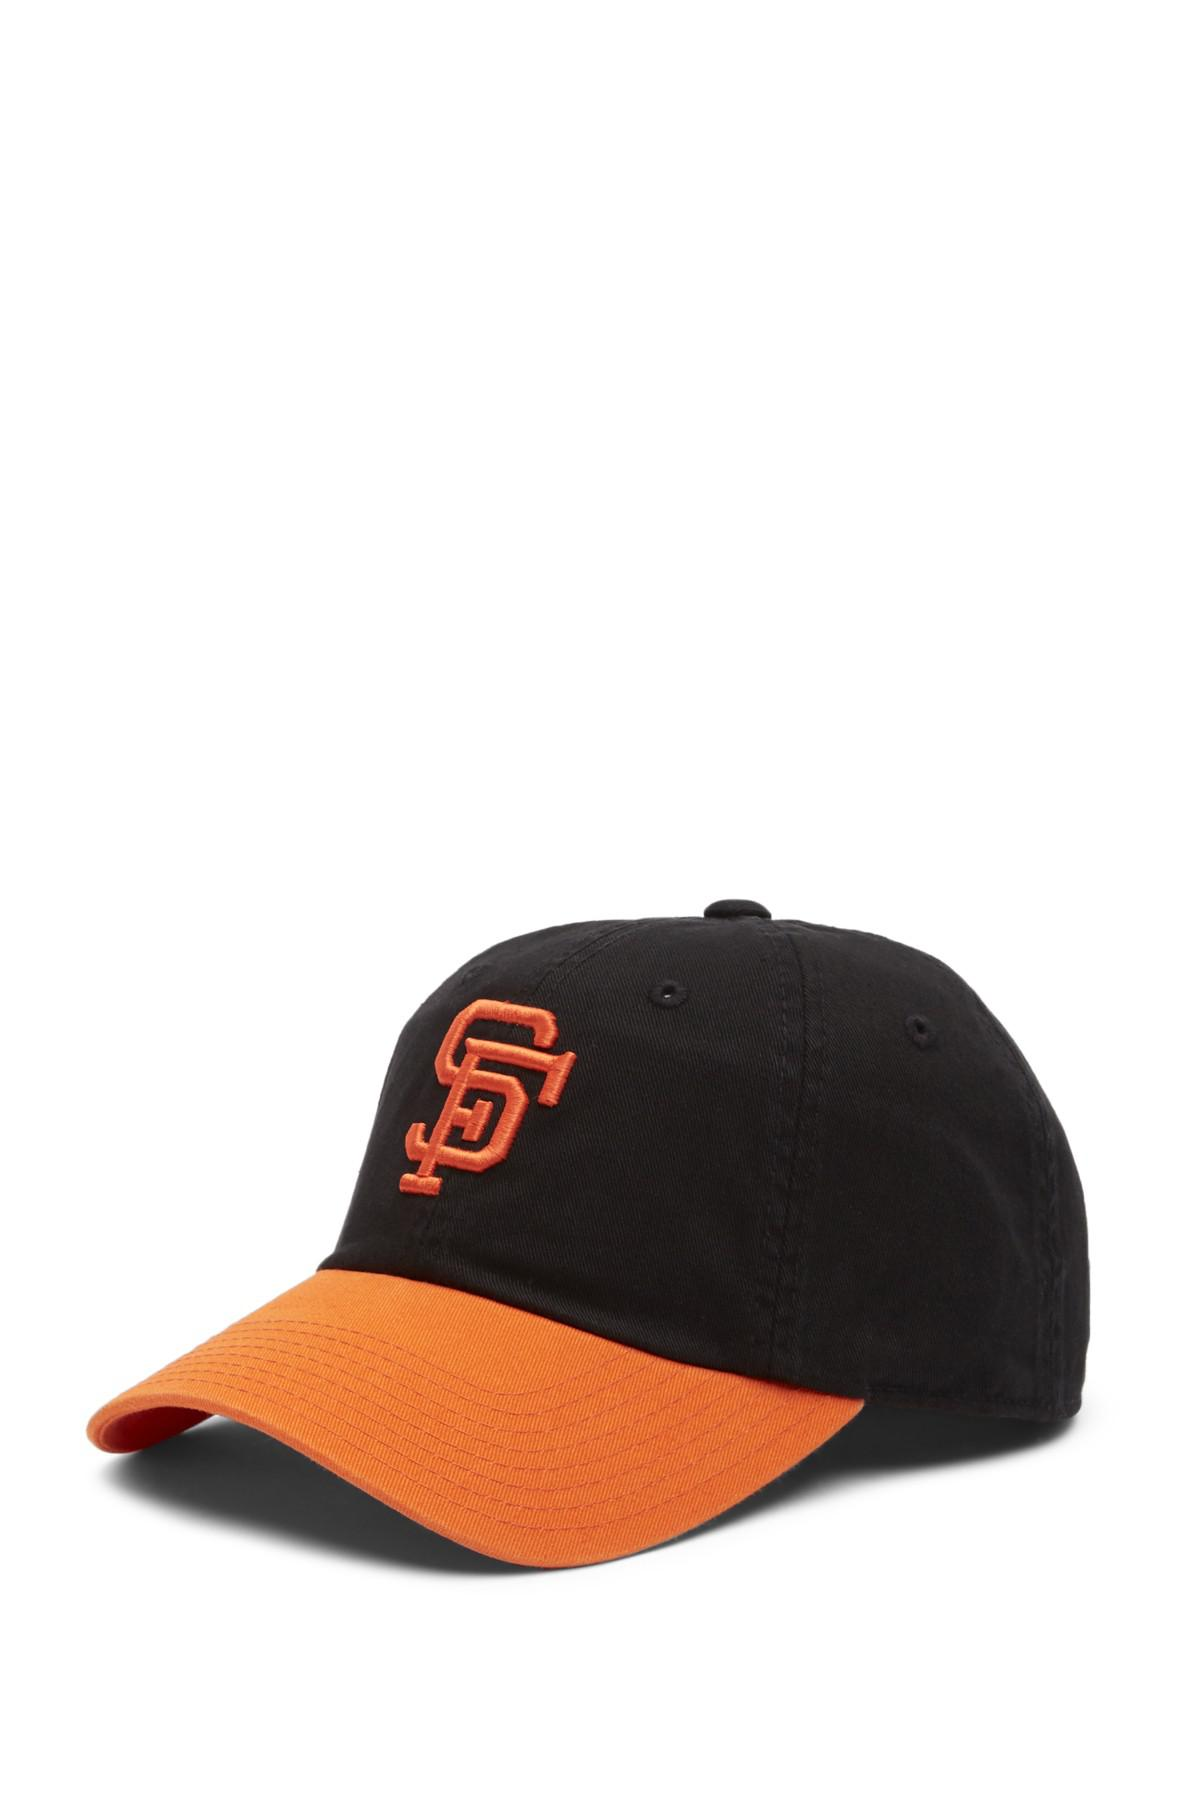 b192b9f39c0 Lyst - American Needle Ballpark San Francisco Giants Baseball Cap in ...